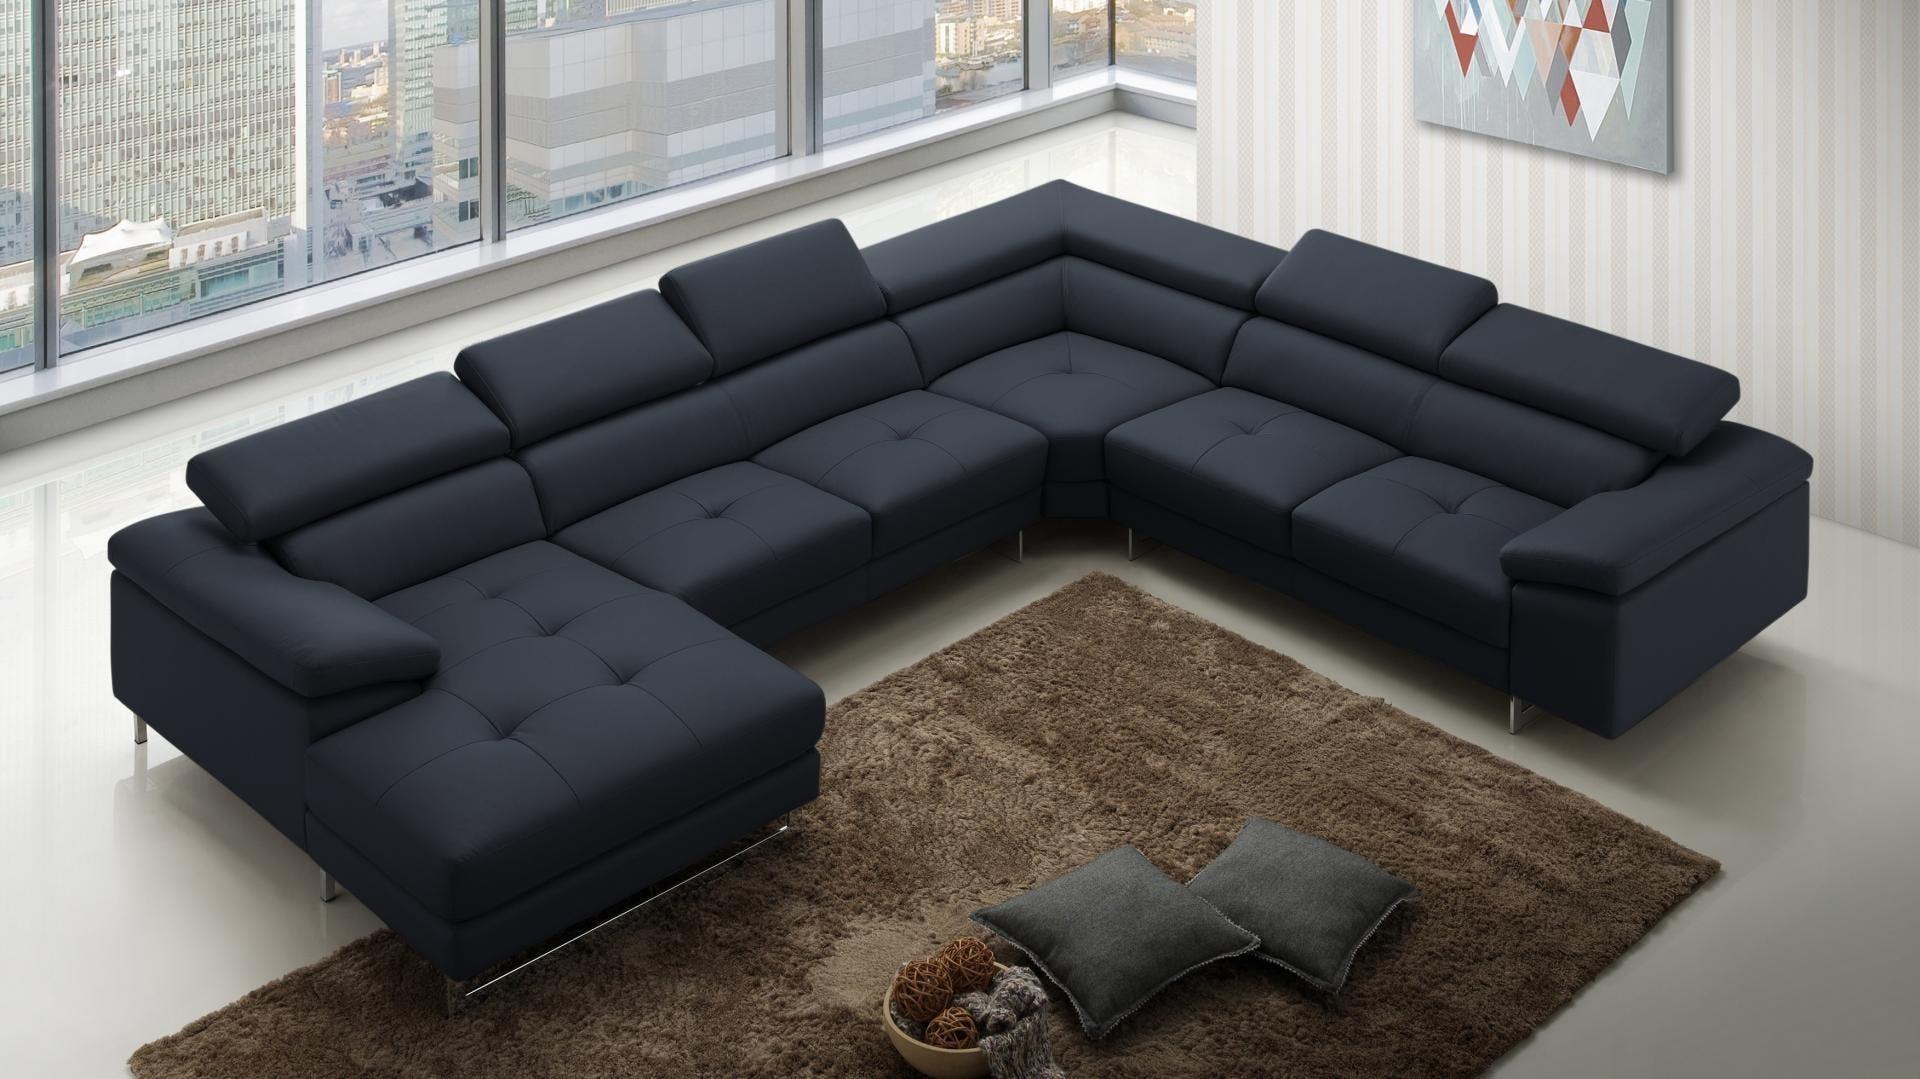 Astonishing Boston Xpress Black Leather Modular Lounge Lounge Life Andrewgaddart Wooden Chair Designs For Living Room Andrewgaddartcom